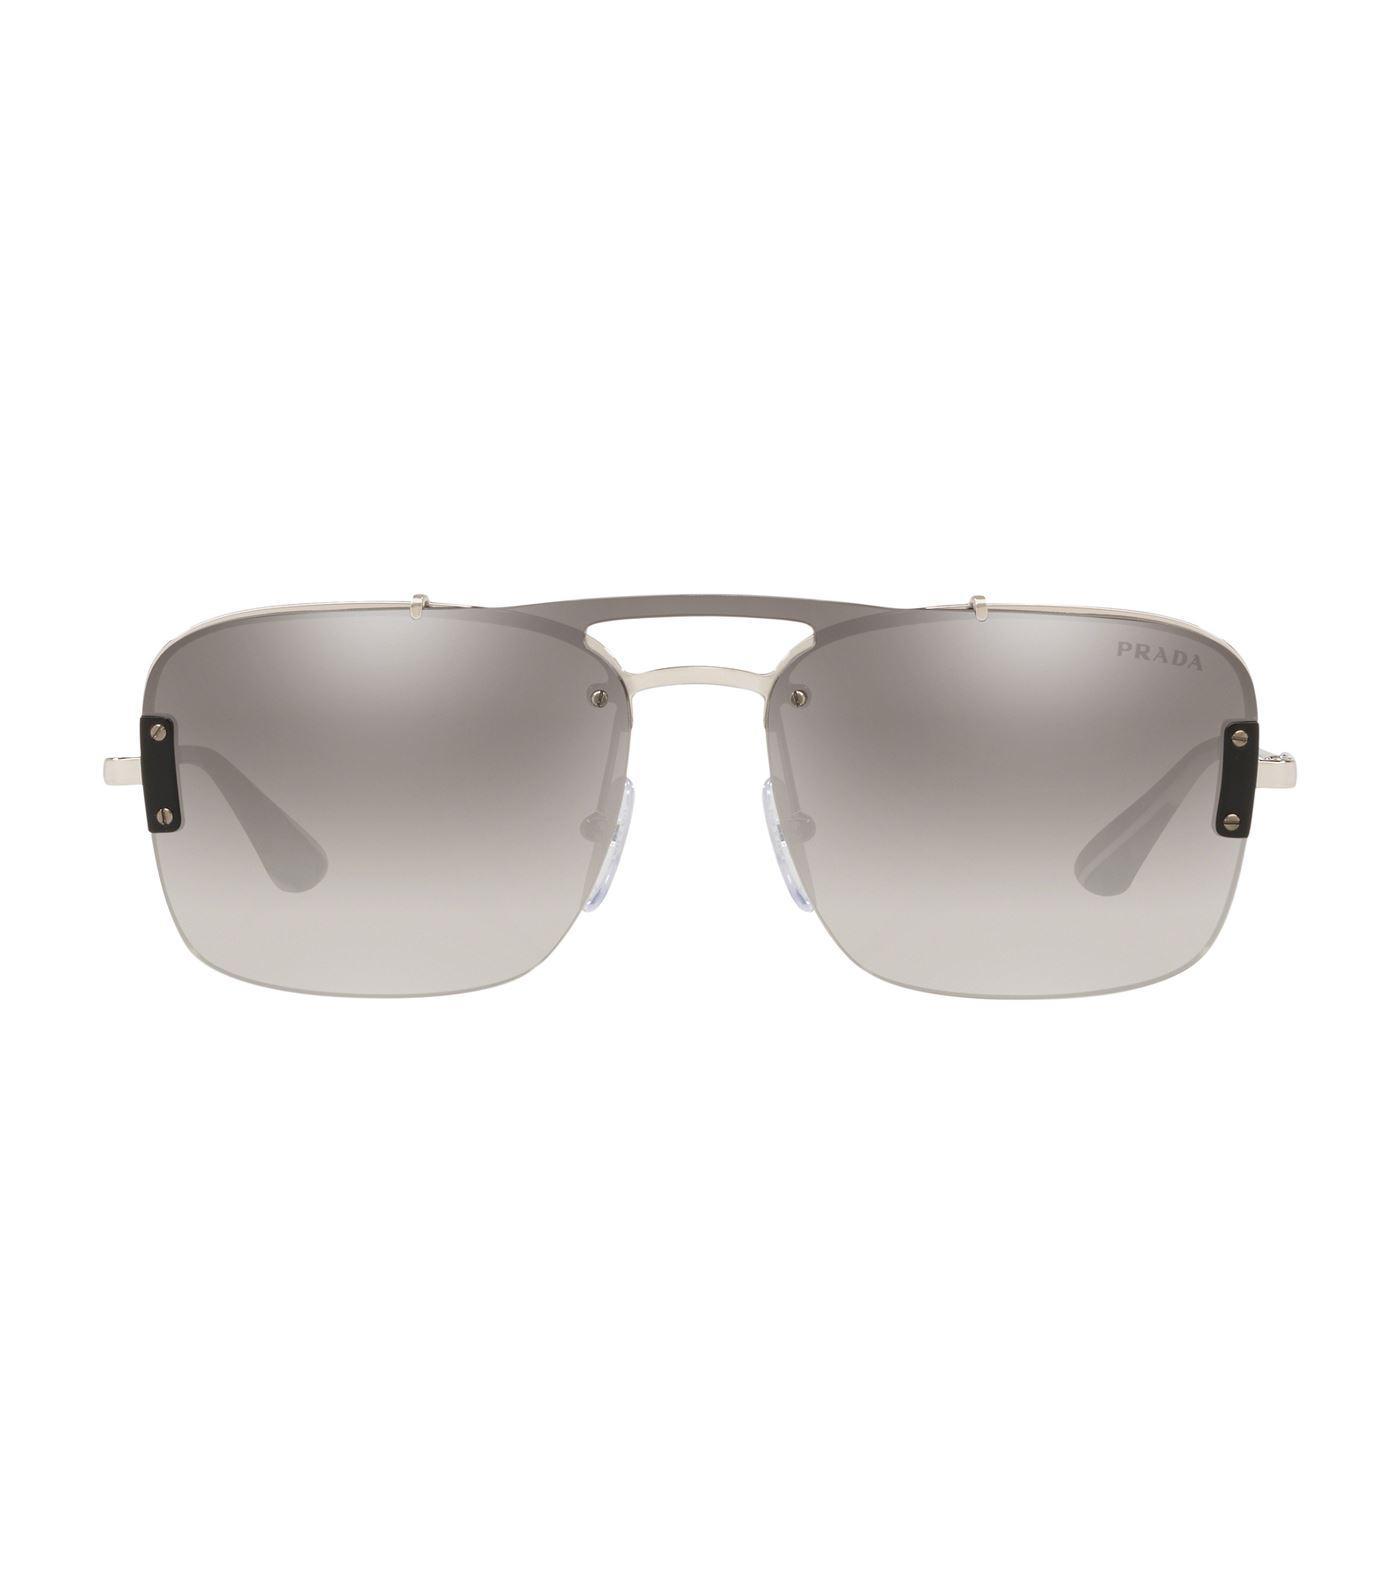 8e063fc0dbc5 Prada - Metallic Pillow Sunglasses for Men - Lyst. View fullscreen